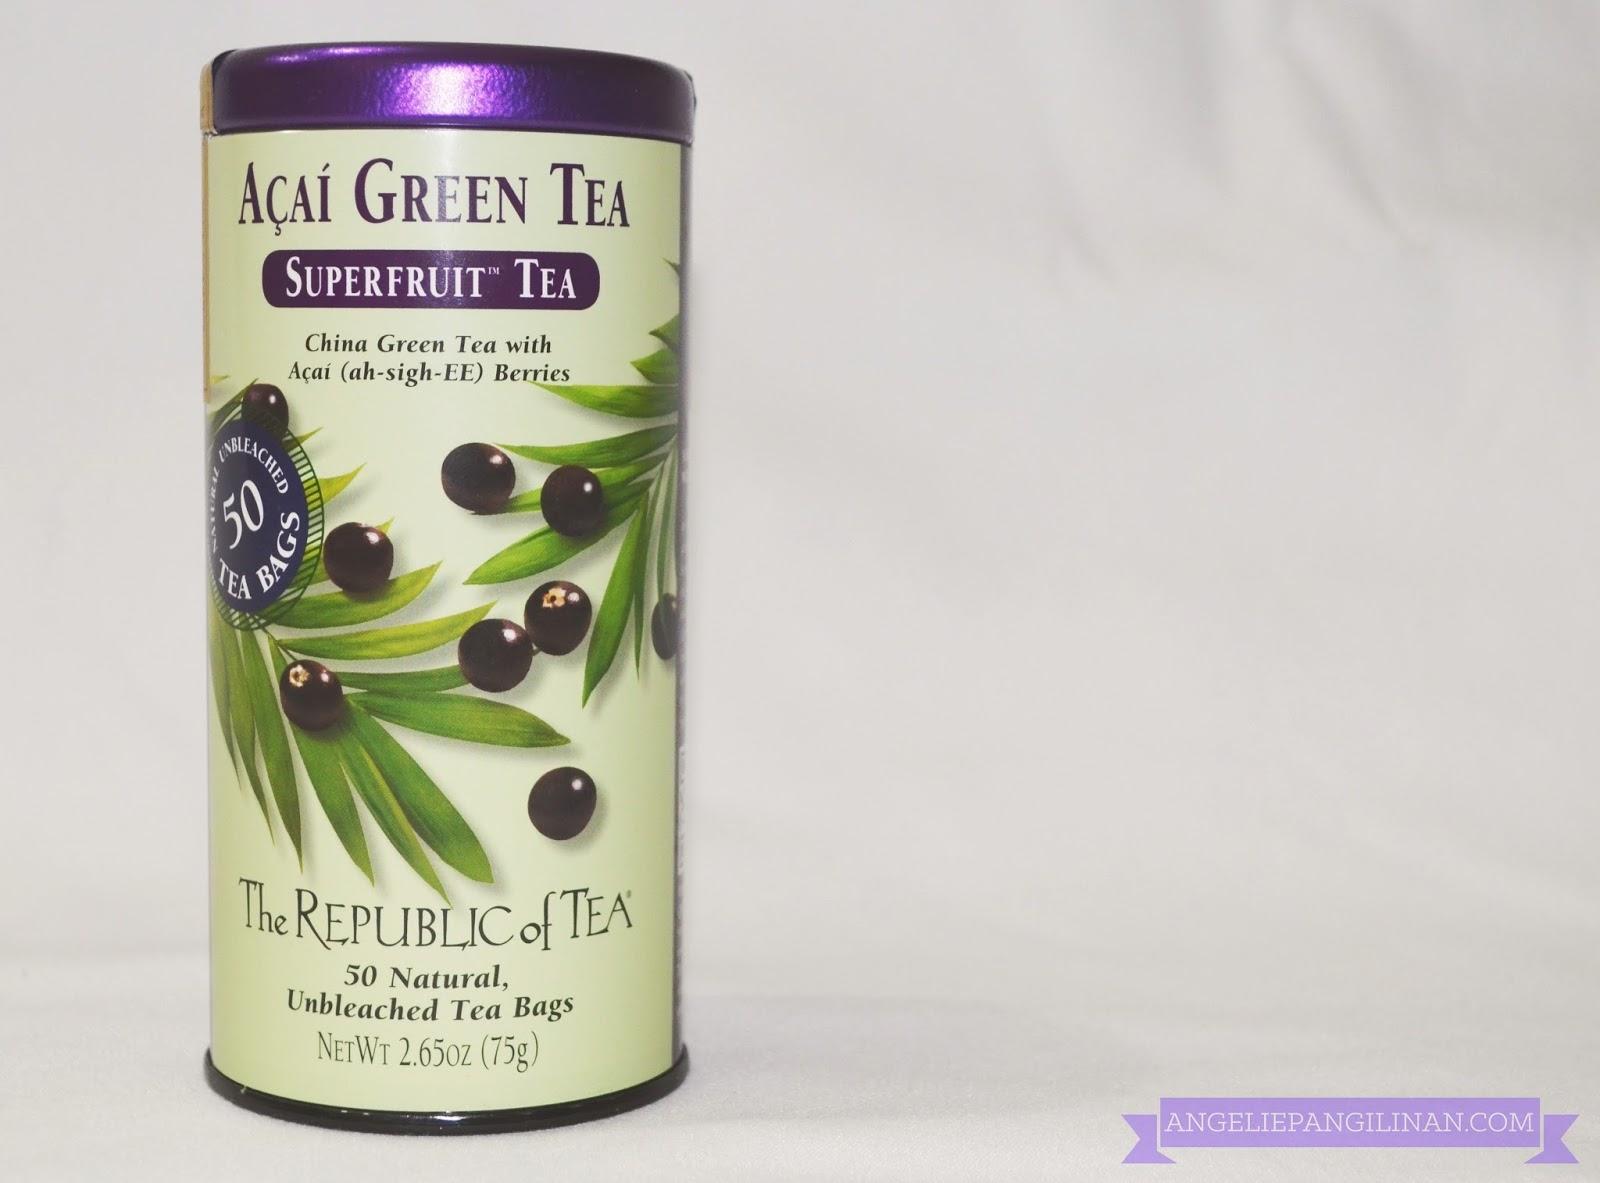 republic of tea acai green tea